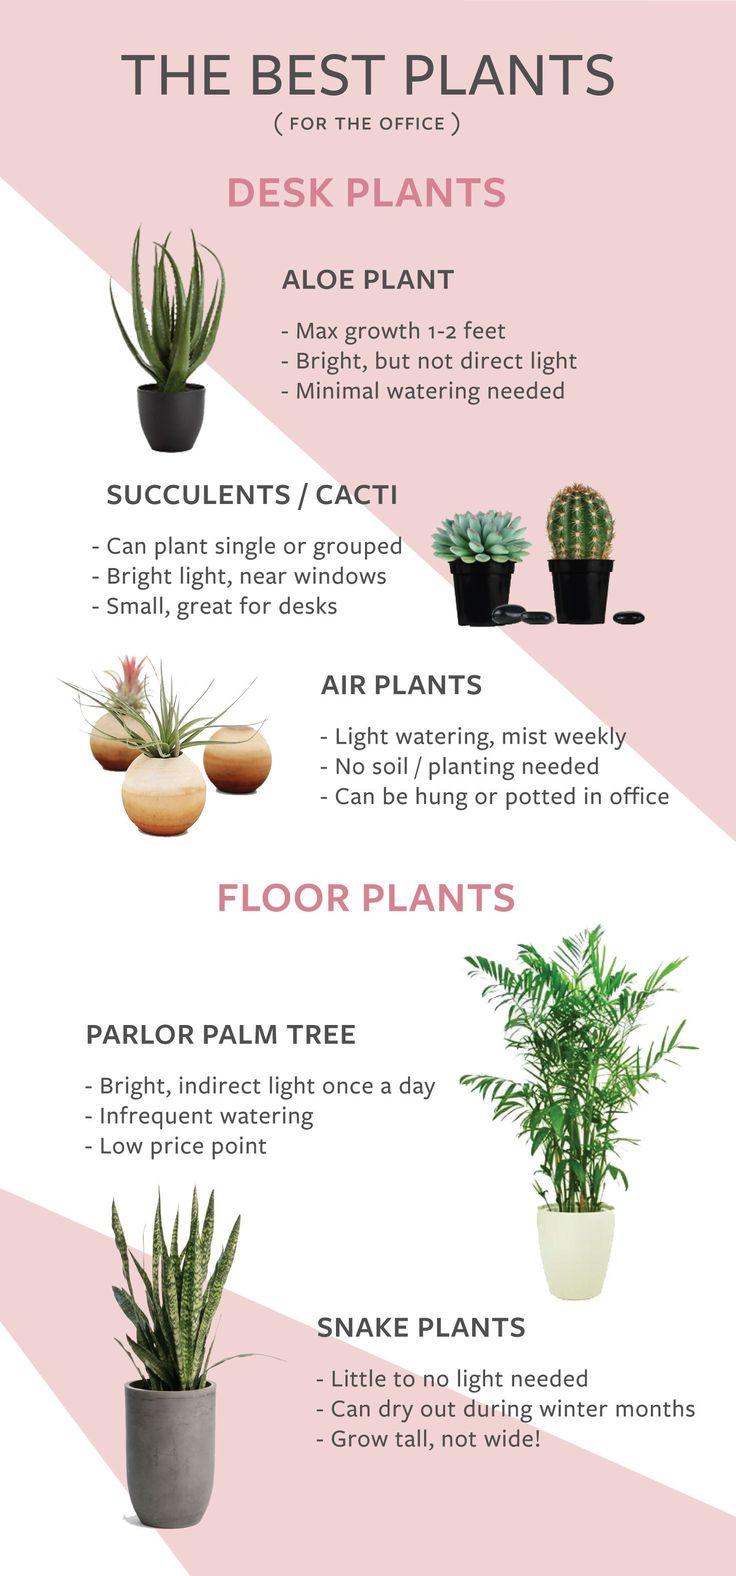 Best 25 office plants ideas on pinterest plants indoor inside plants and low light plants - The best office plants ...